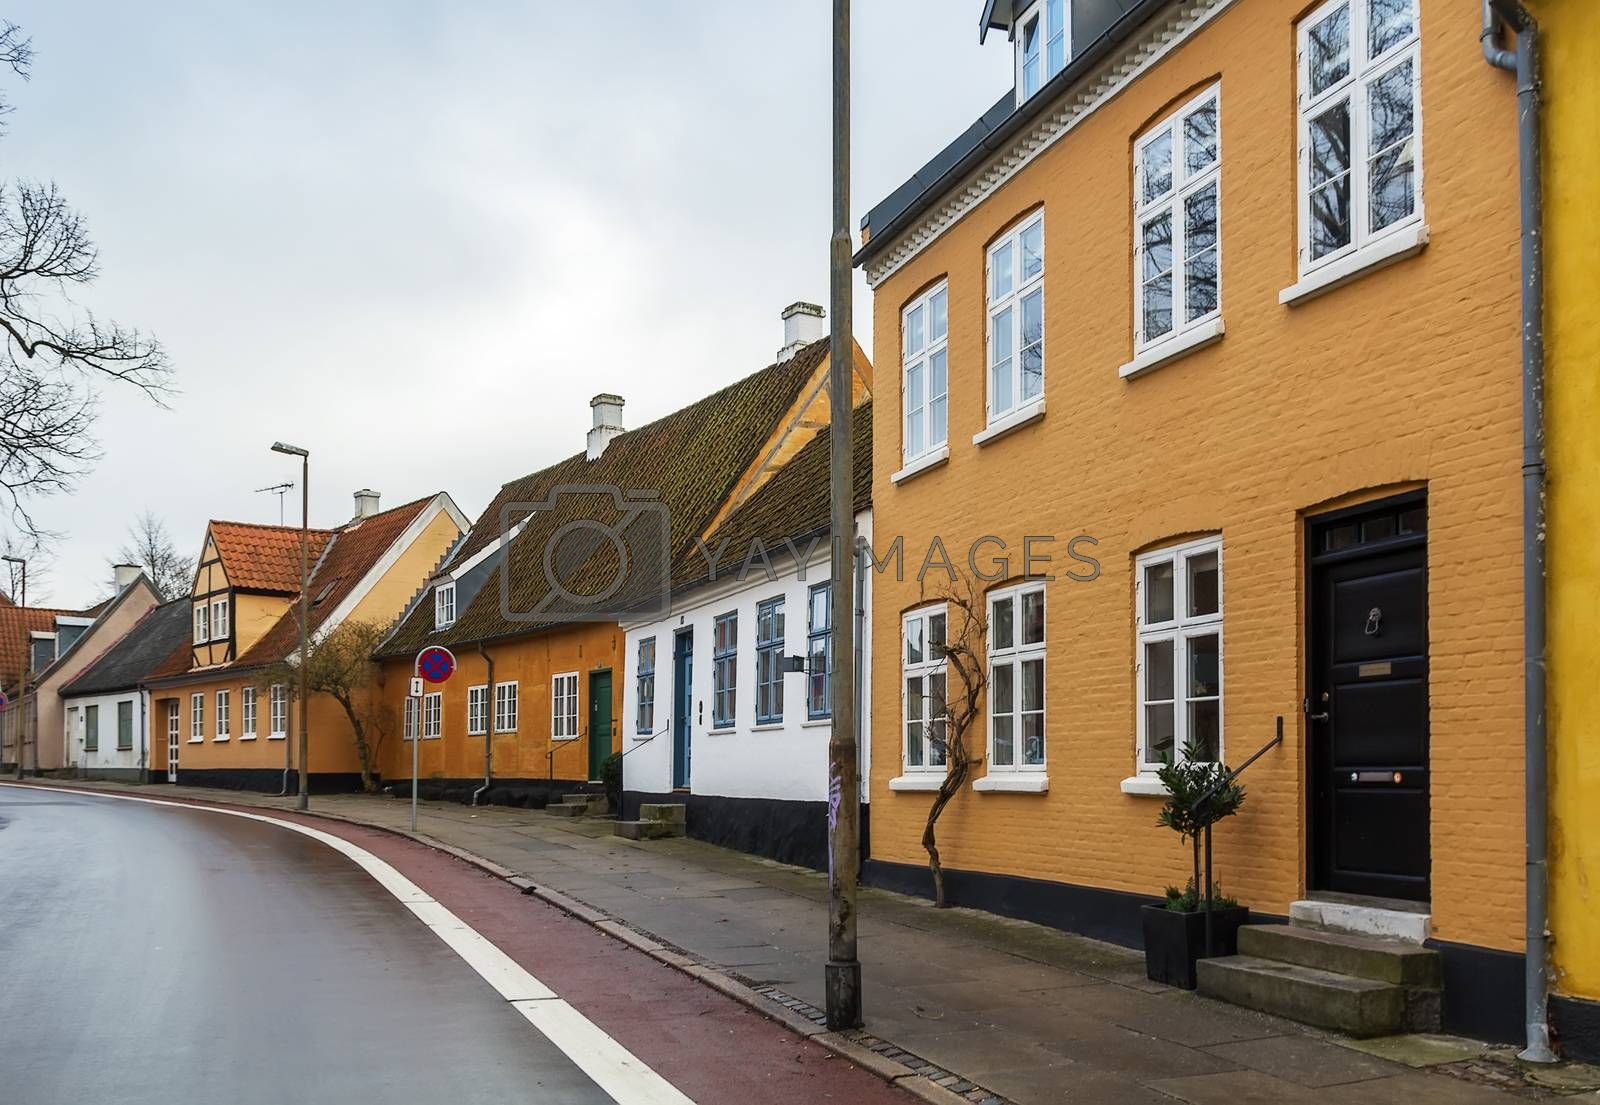 street in  Roskilde, Denmark by borisb17